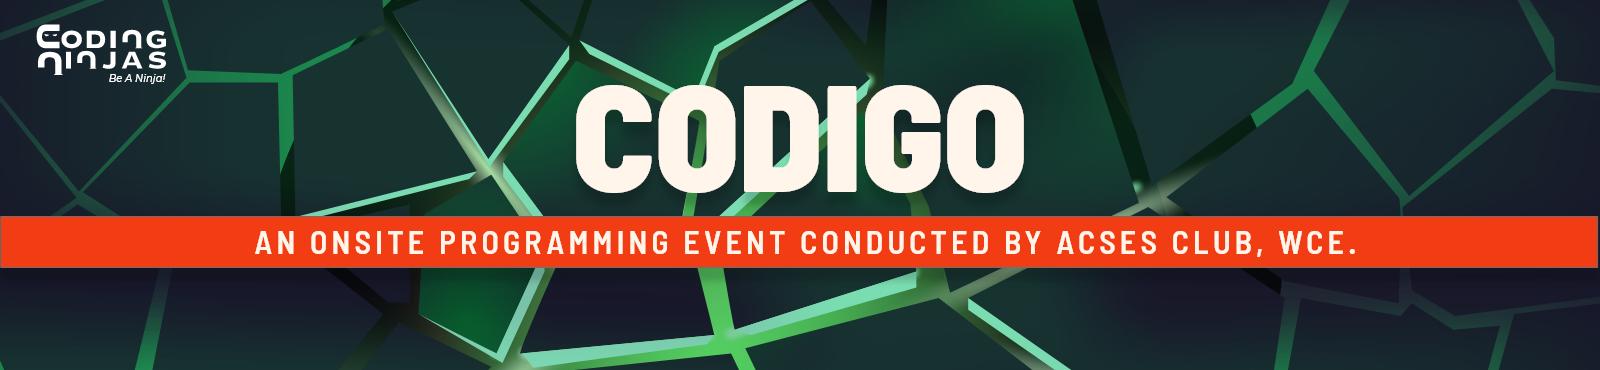 CODIGO, ACSES club, WCE, Sangli